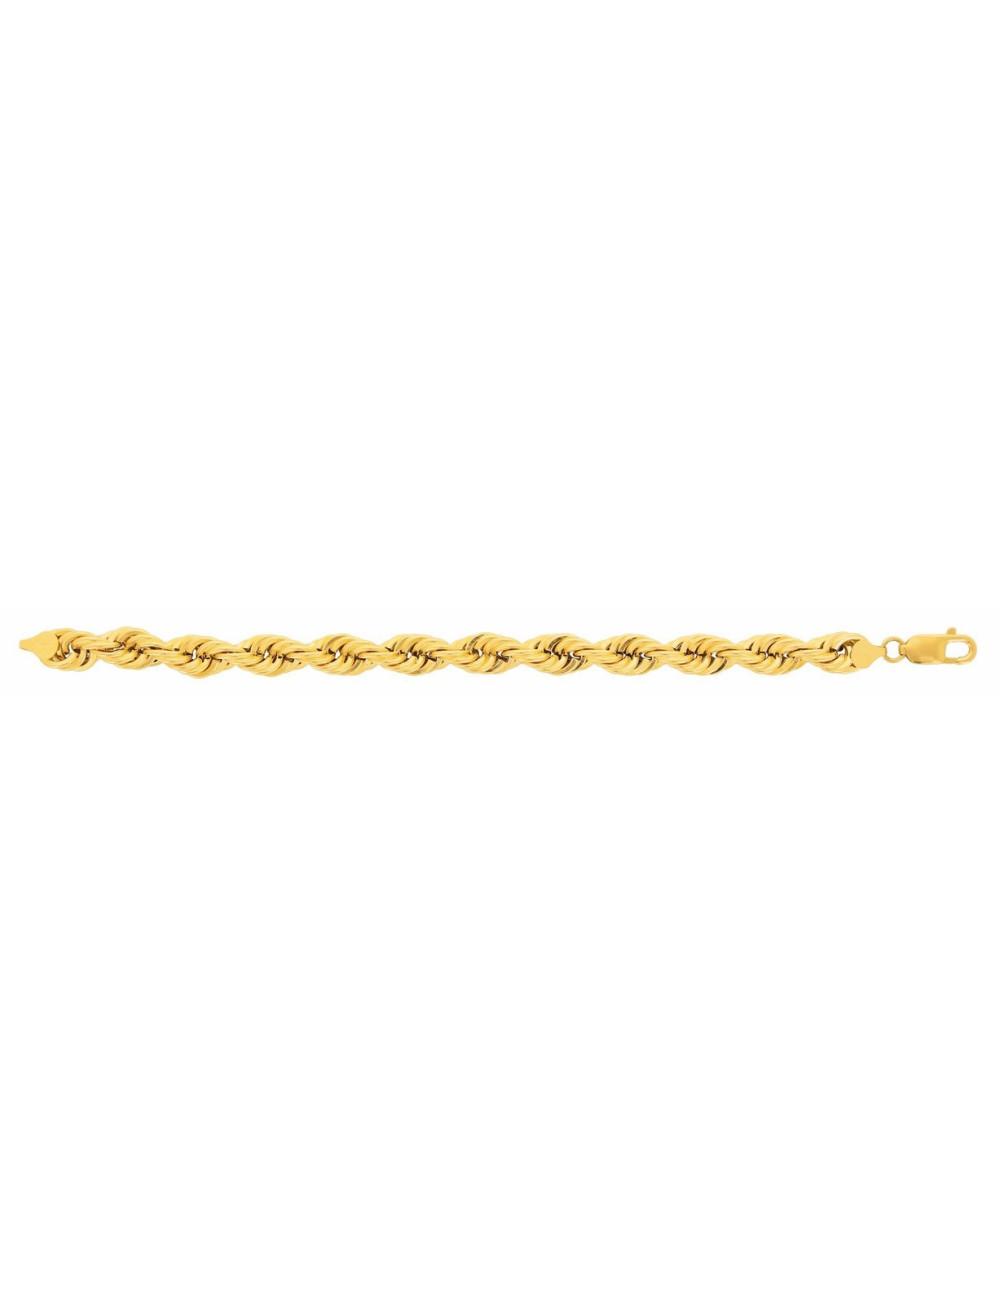 Bracelet maille femme or jaune pas cher